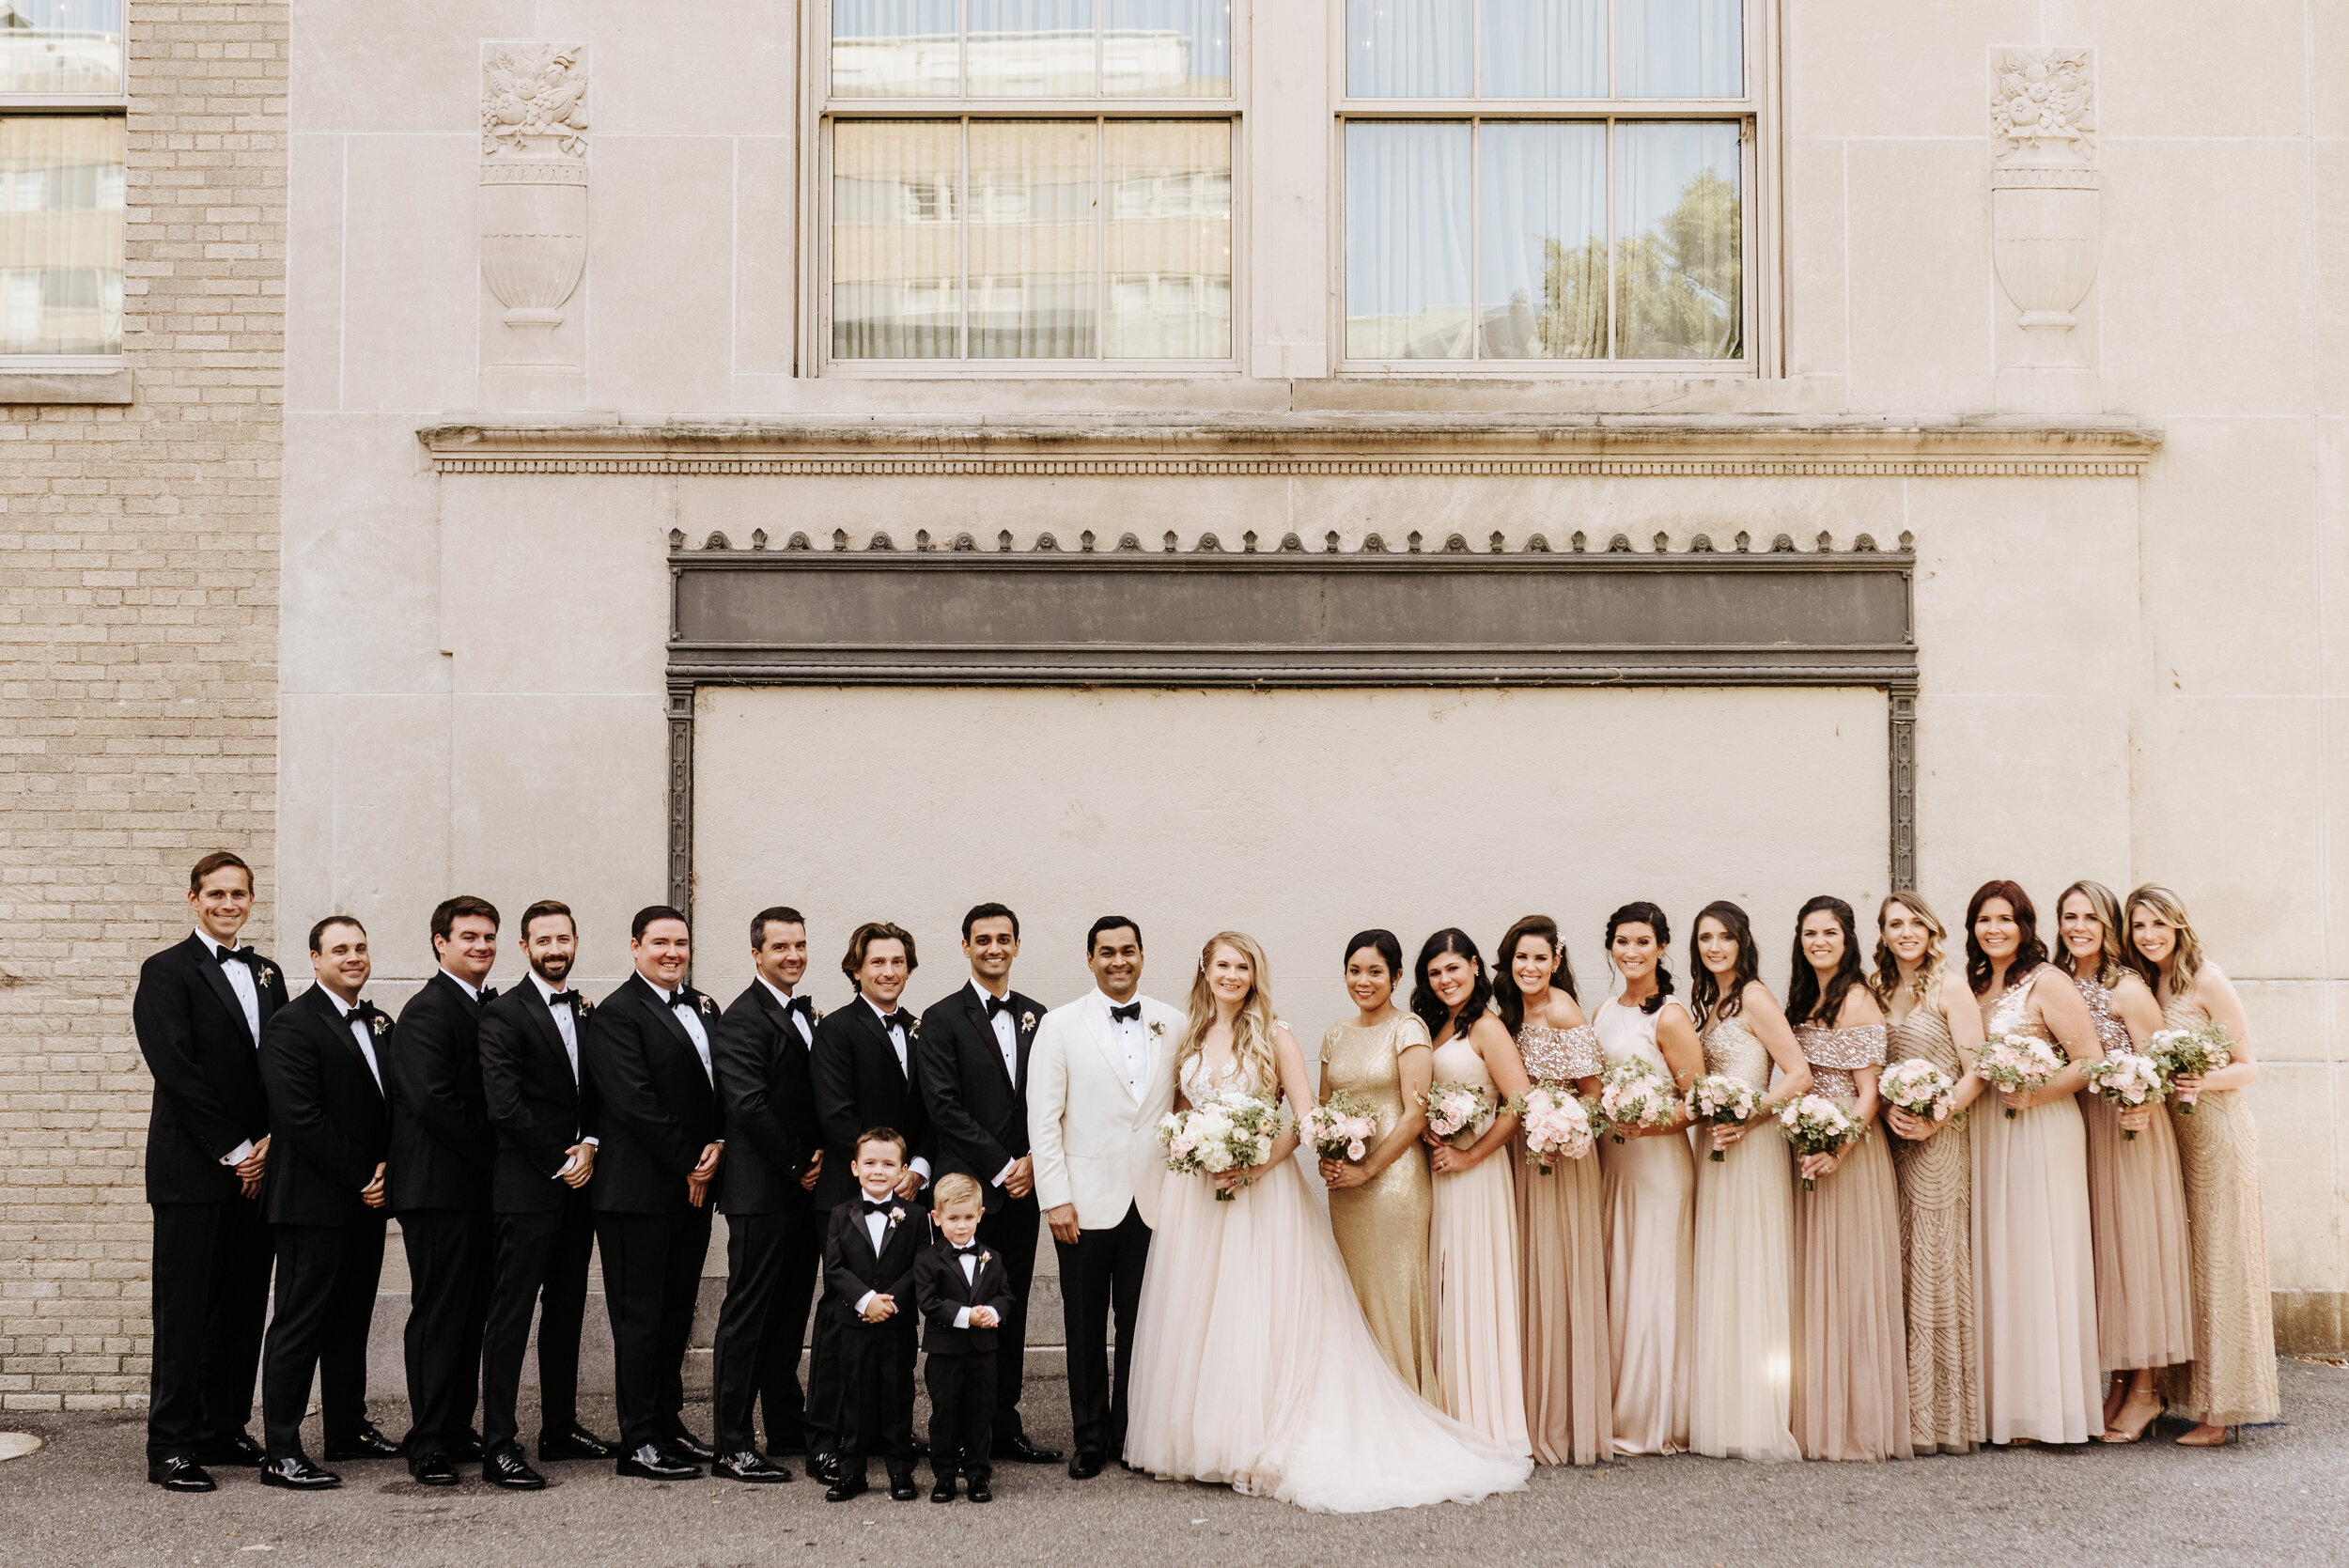 Cassie-Mrunal-Wedding-Quirk-Hotel-John-Marshall-Ballrooms-Richmond-Virginia-Photography-by-V-56.jpg